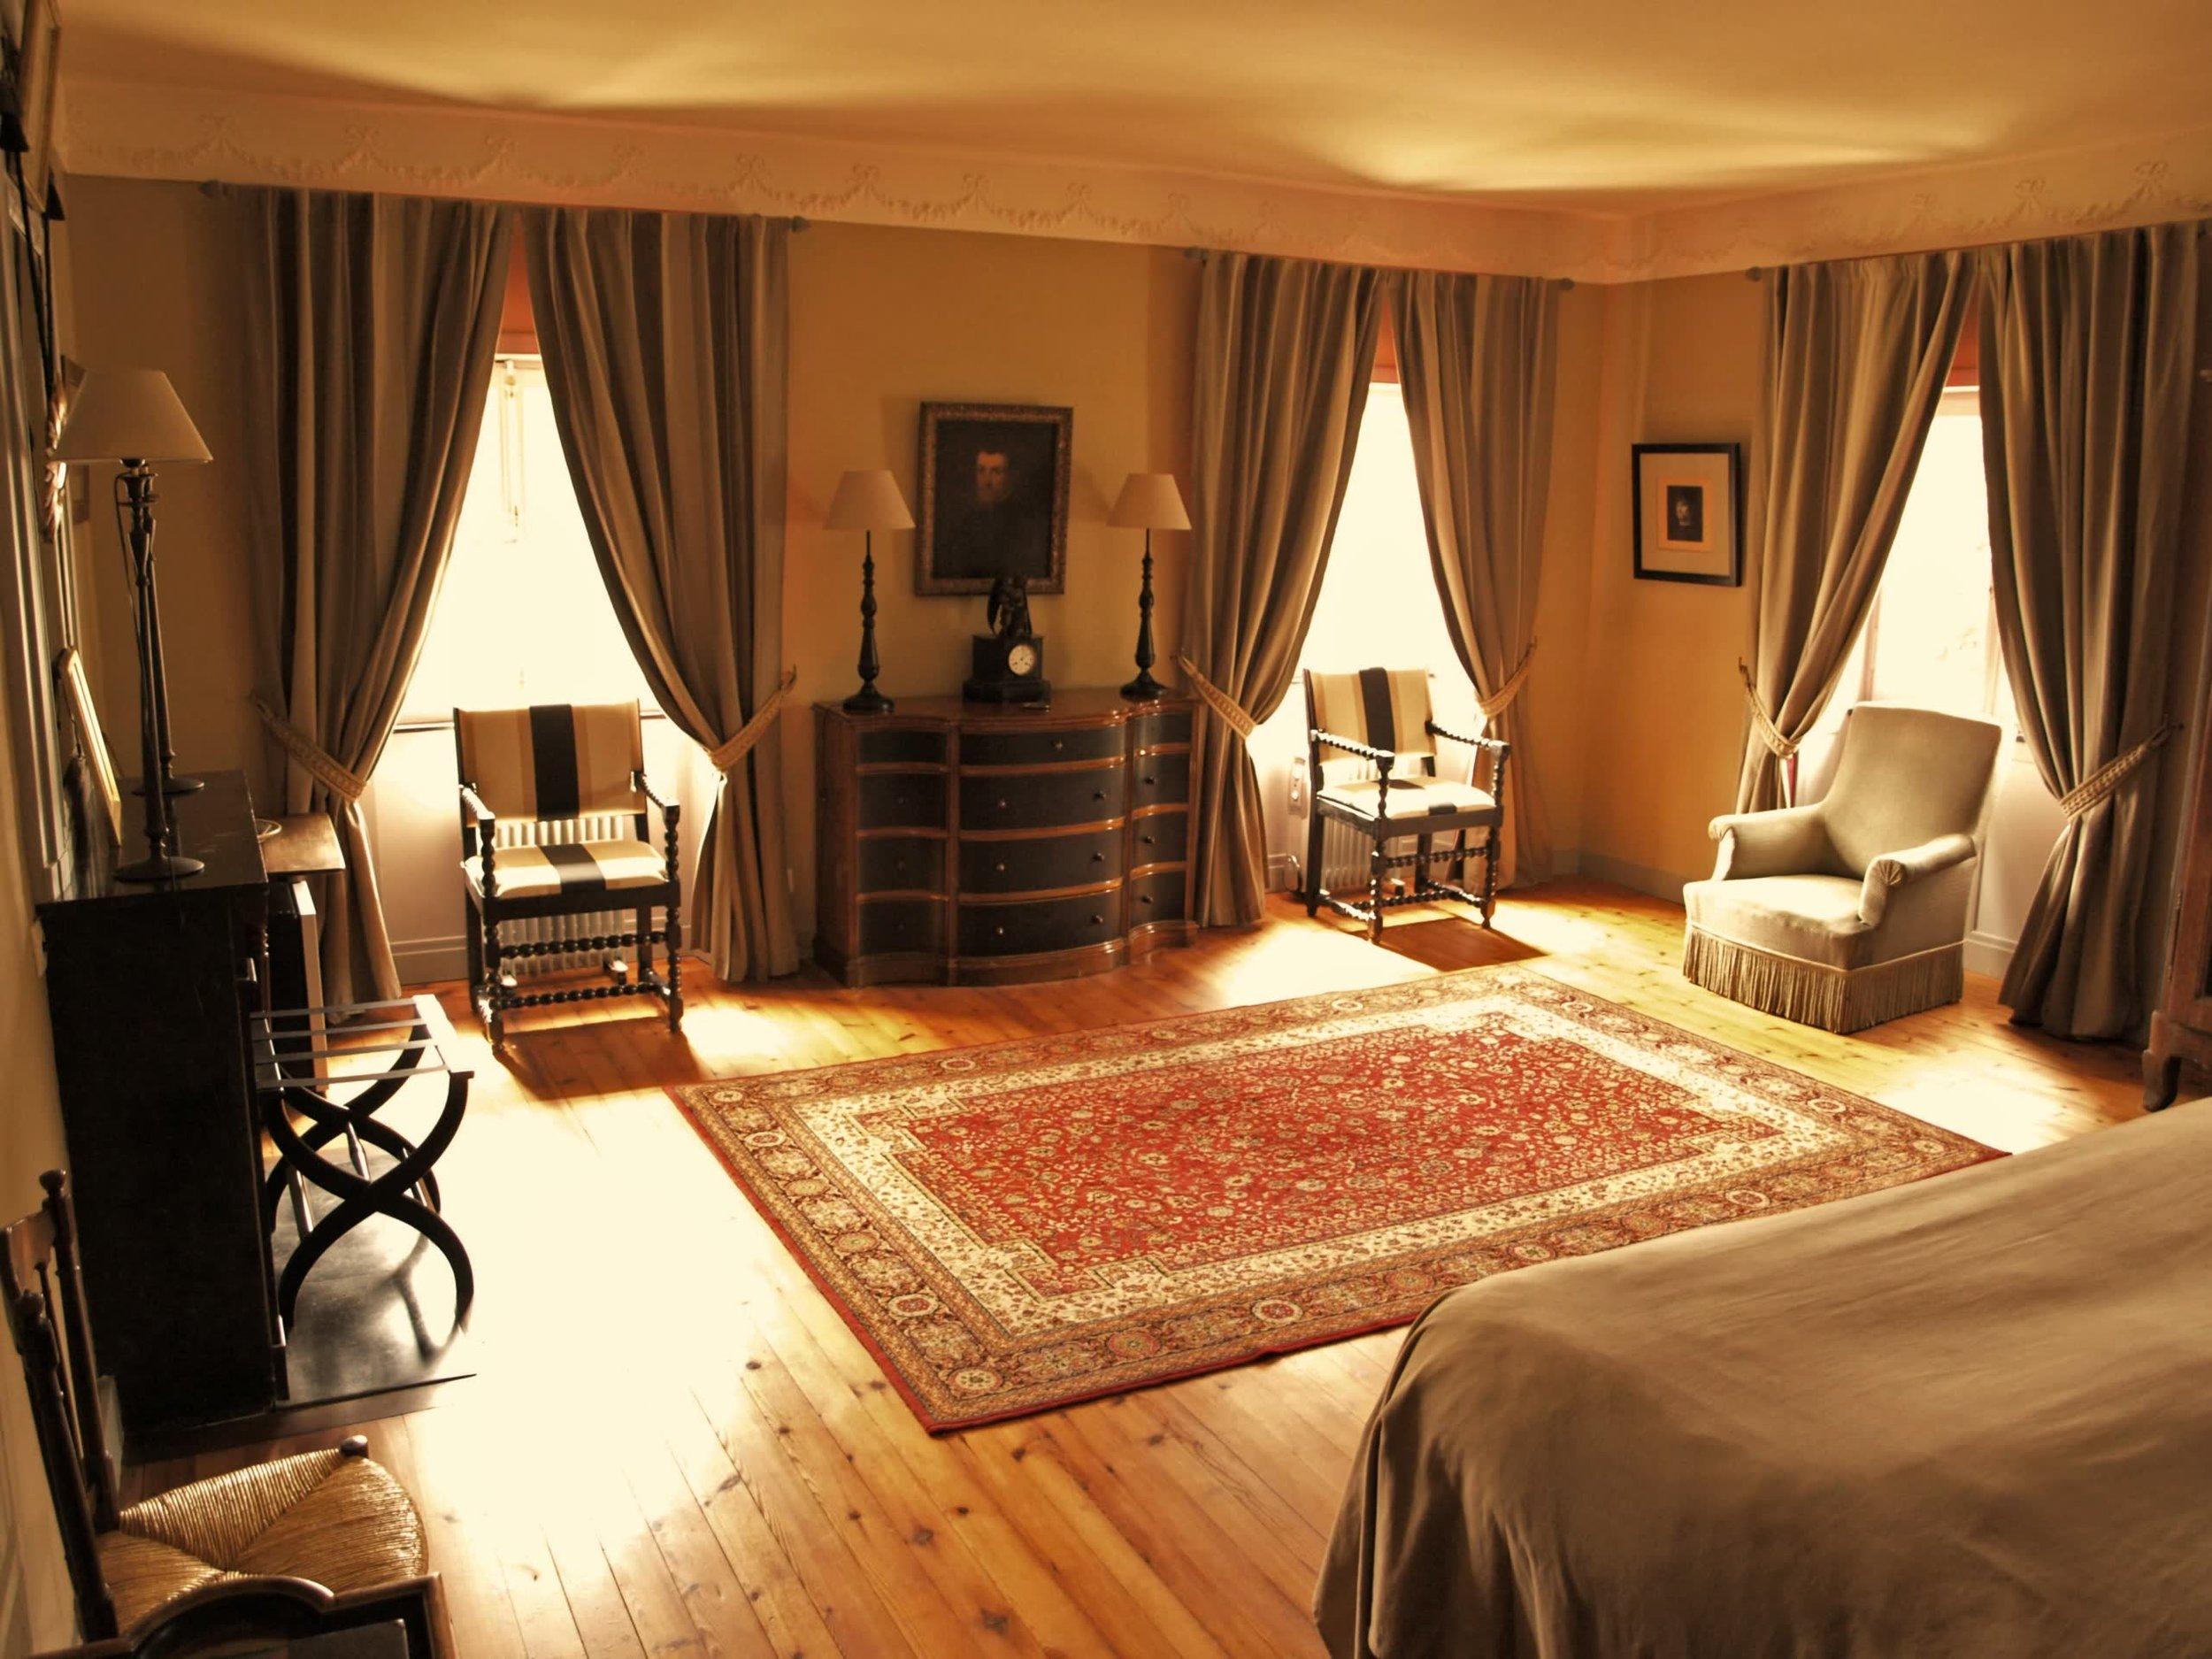 Chateau de la Pommeraye - charming boutique hotel chateau b&b spa normandy calvados bedroom Esquisses 3(2).jpg